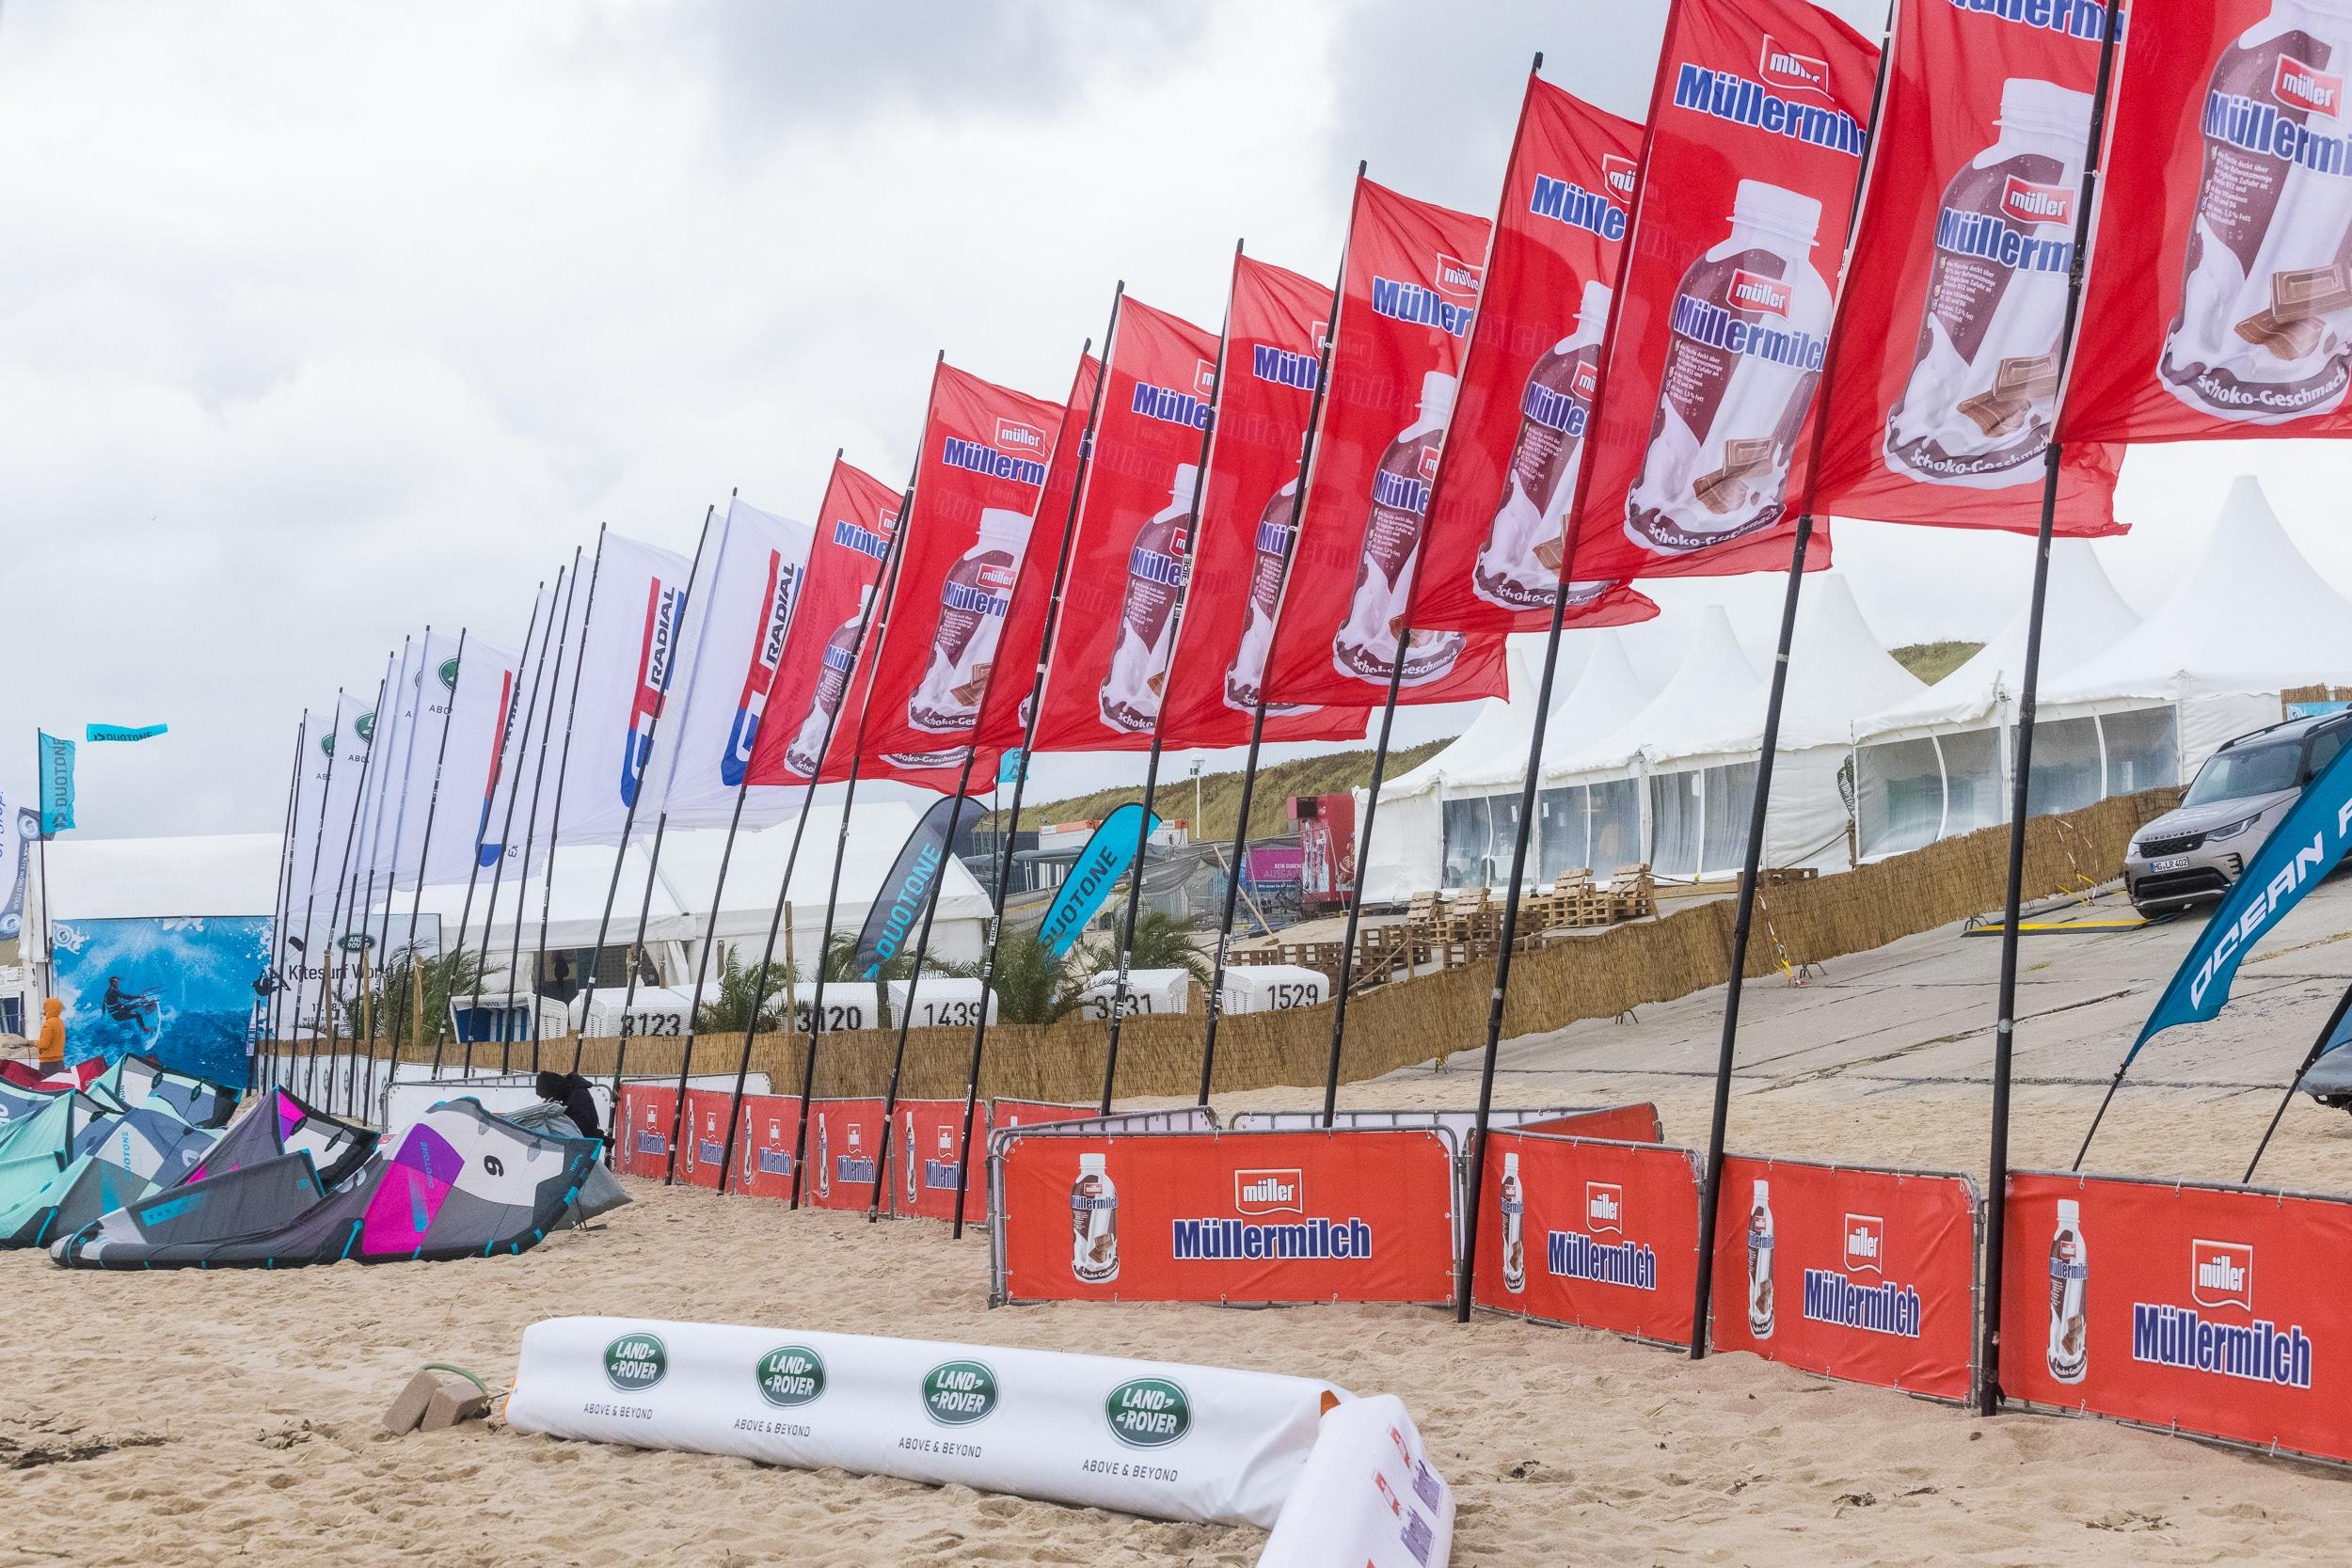 Land Rover Kitesurf Worldcup Sylt 2021